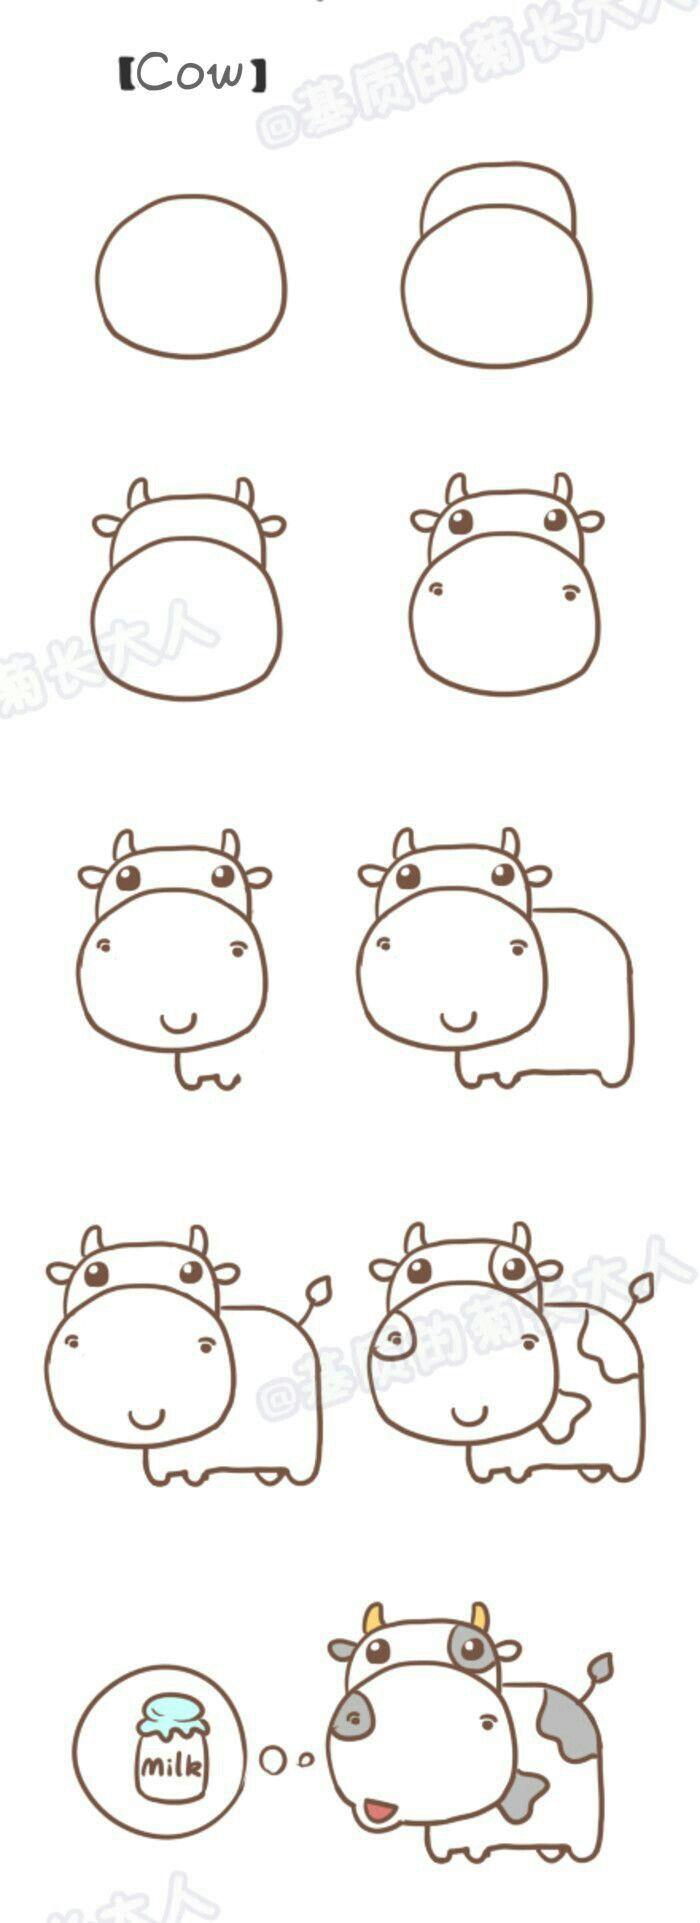 Kuh how2draw easy xow doodle